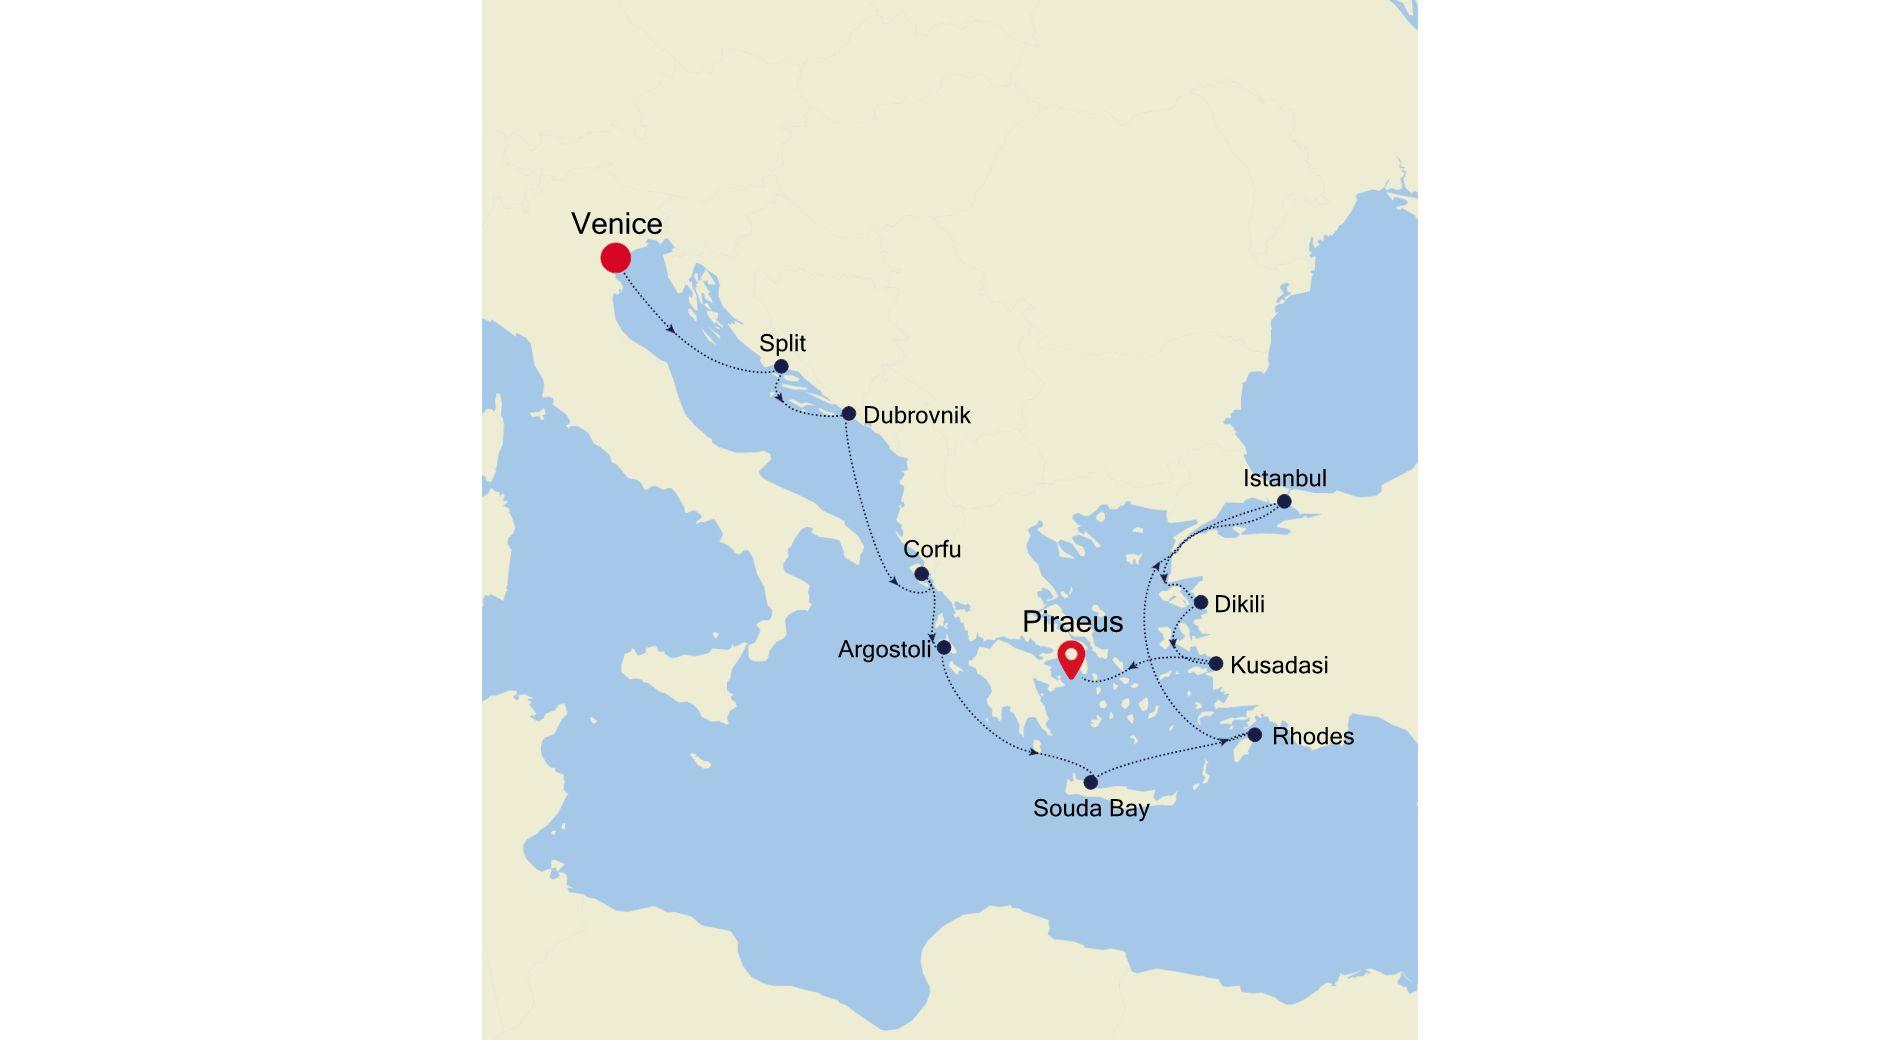 DA211001012 - Venice à Piraeus